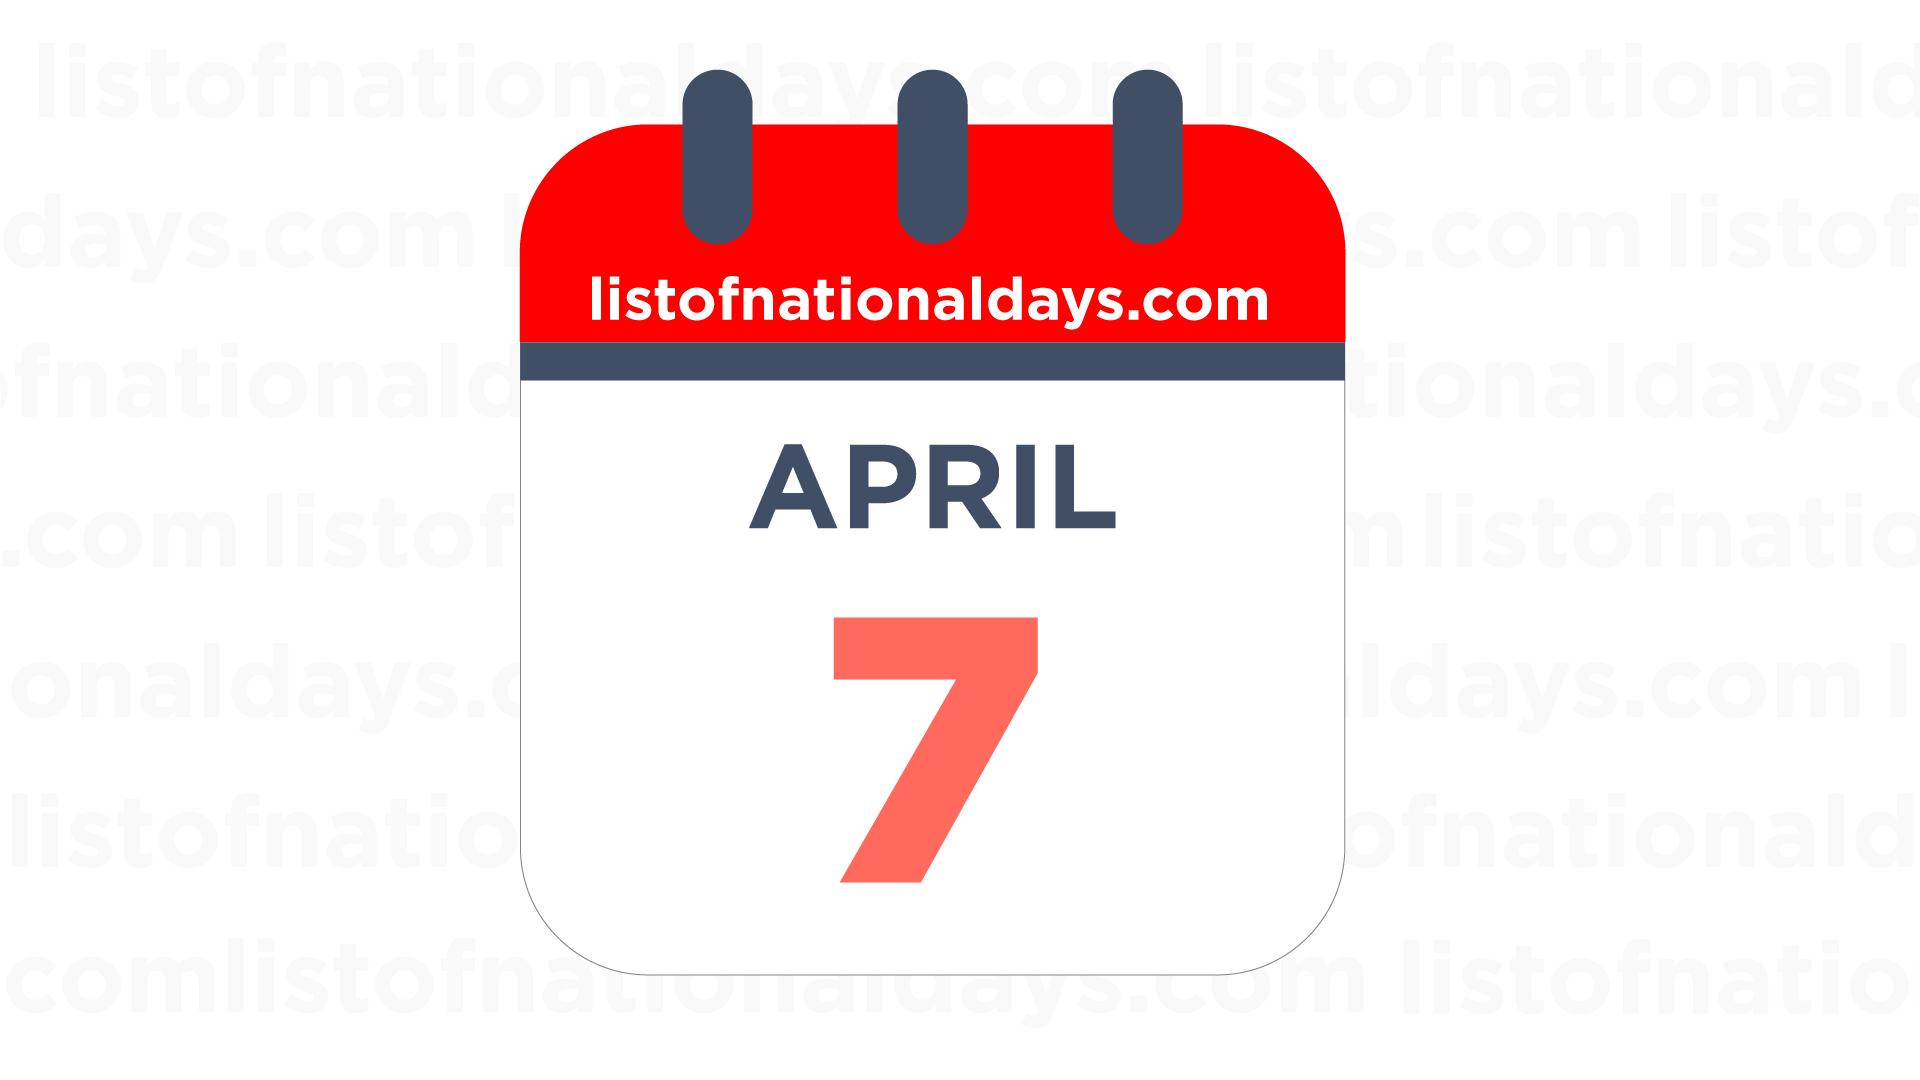 APRIL 7TH: National Holidays, Observances & Famous Birthdays